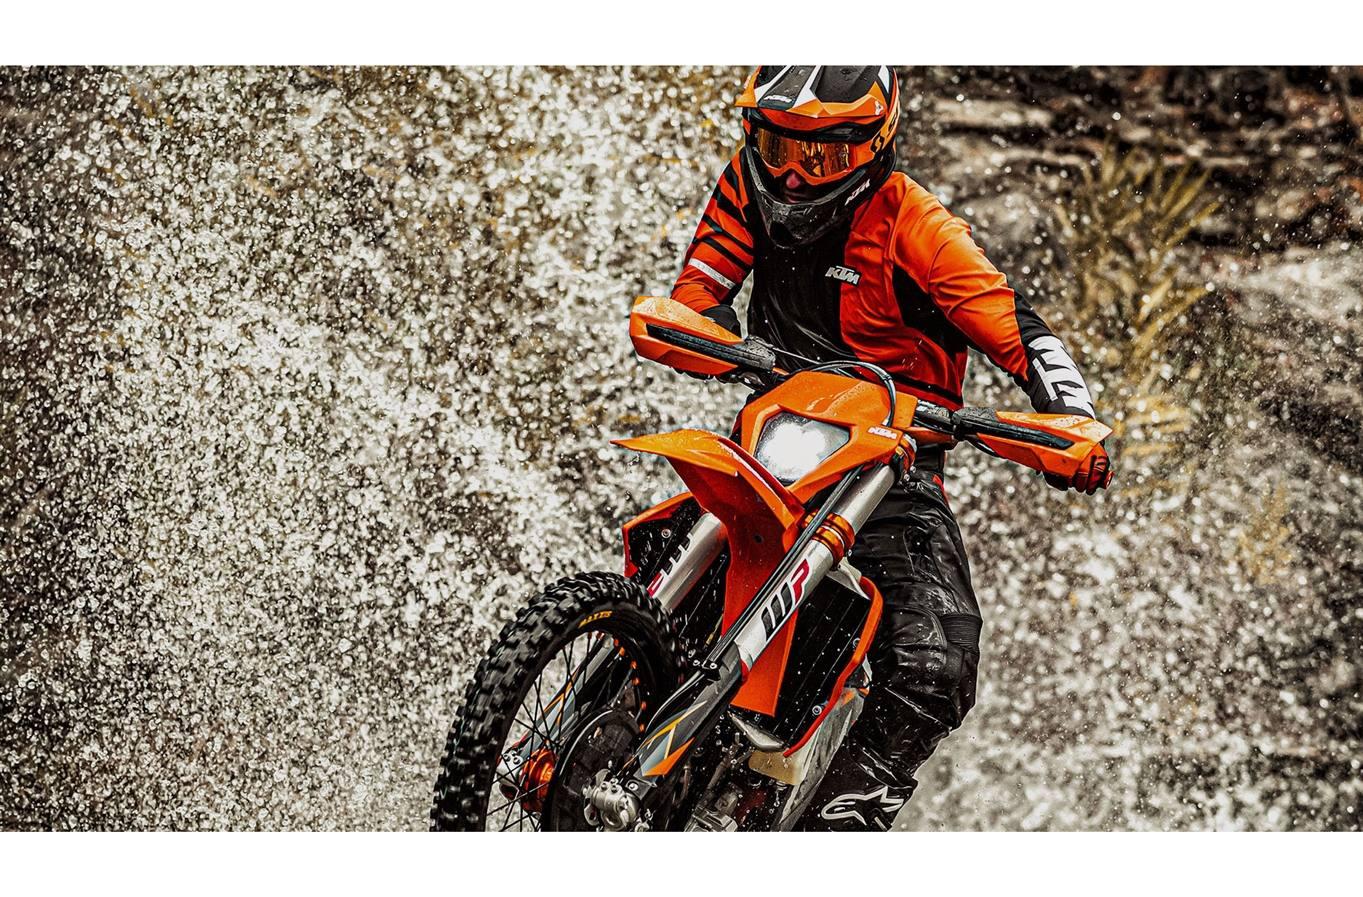 2020 KTM 390 Duke for sale in Austin, TX. TJs Cycle Sales